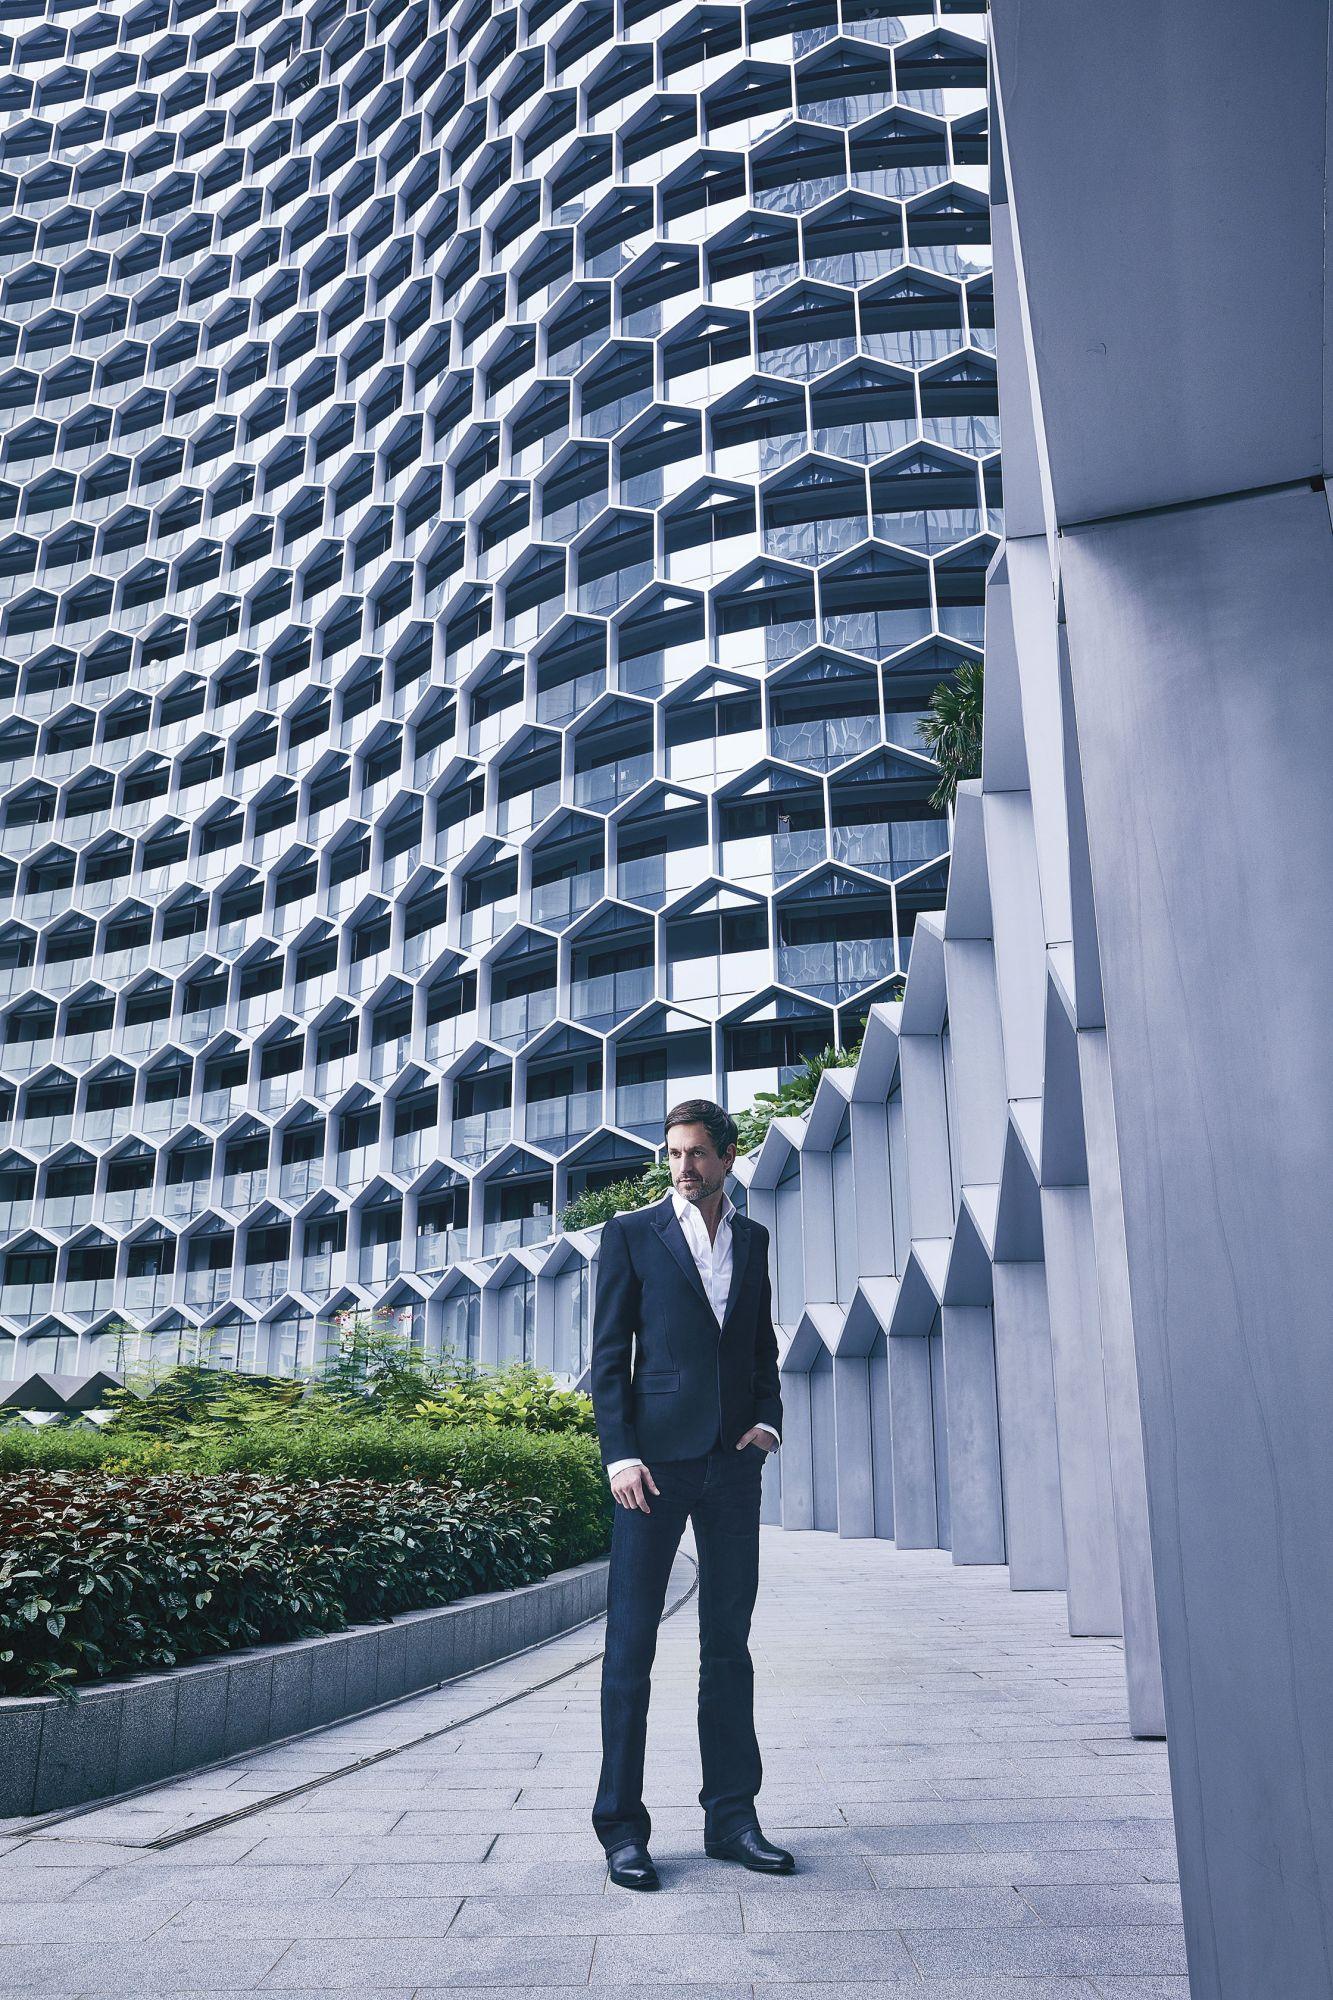 Design Speak: Ole Scheeren Reinvents The Modern Skyscraper